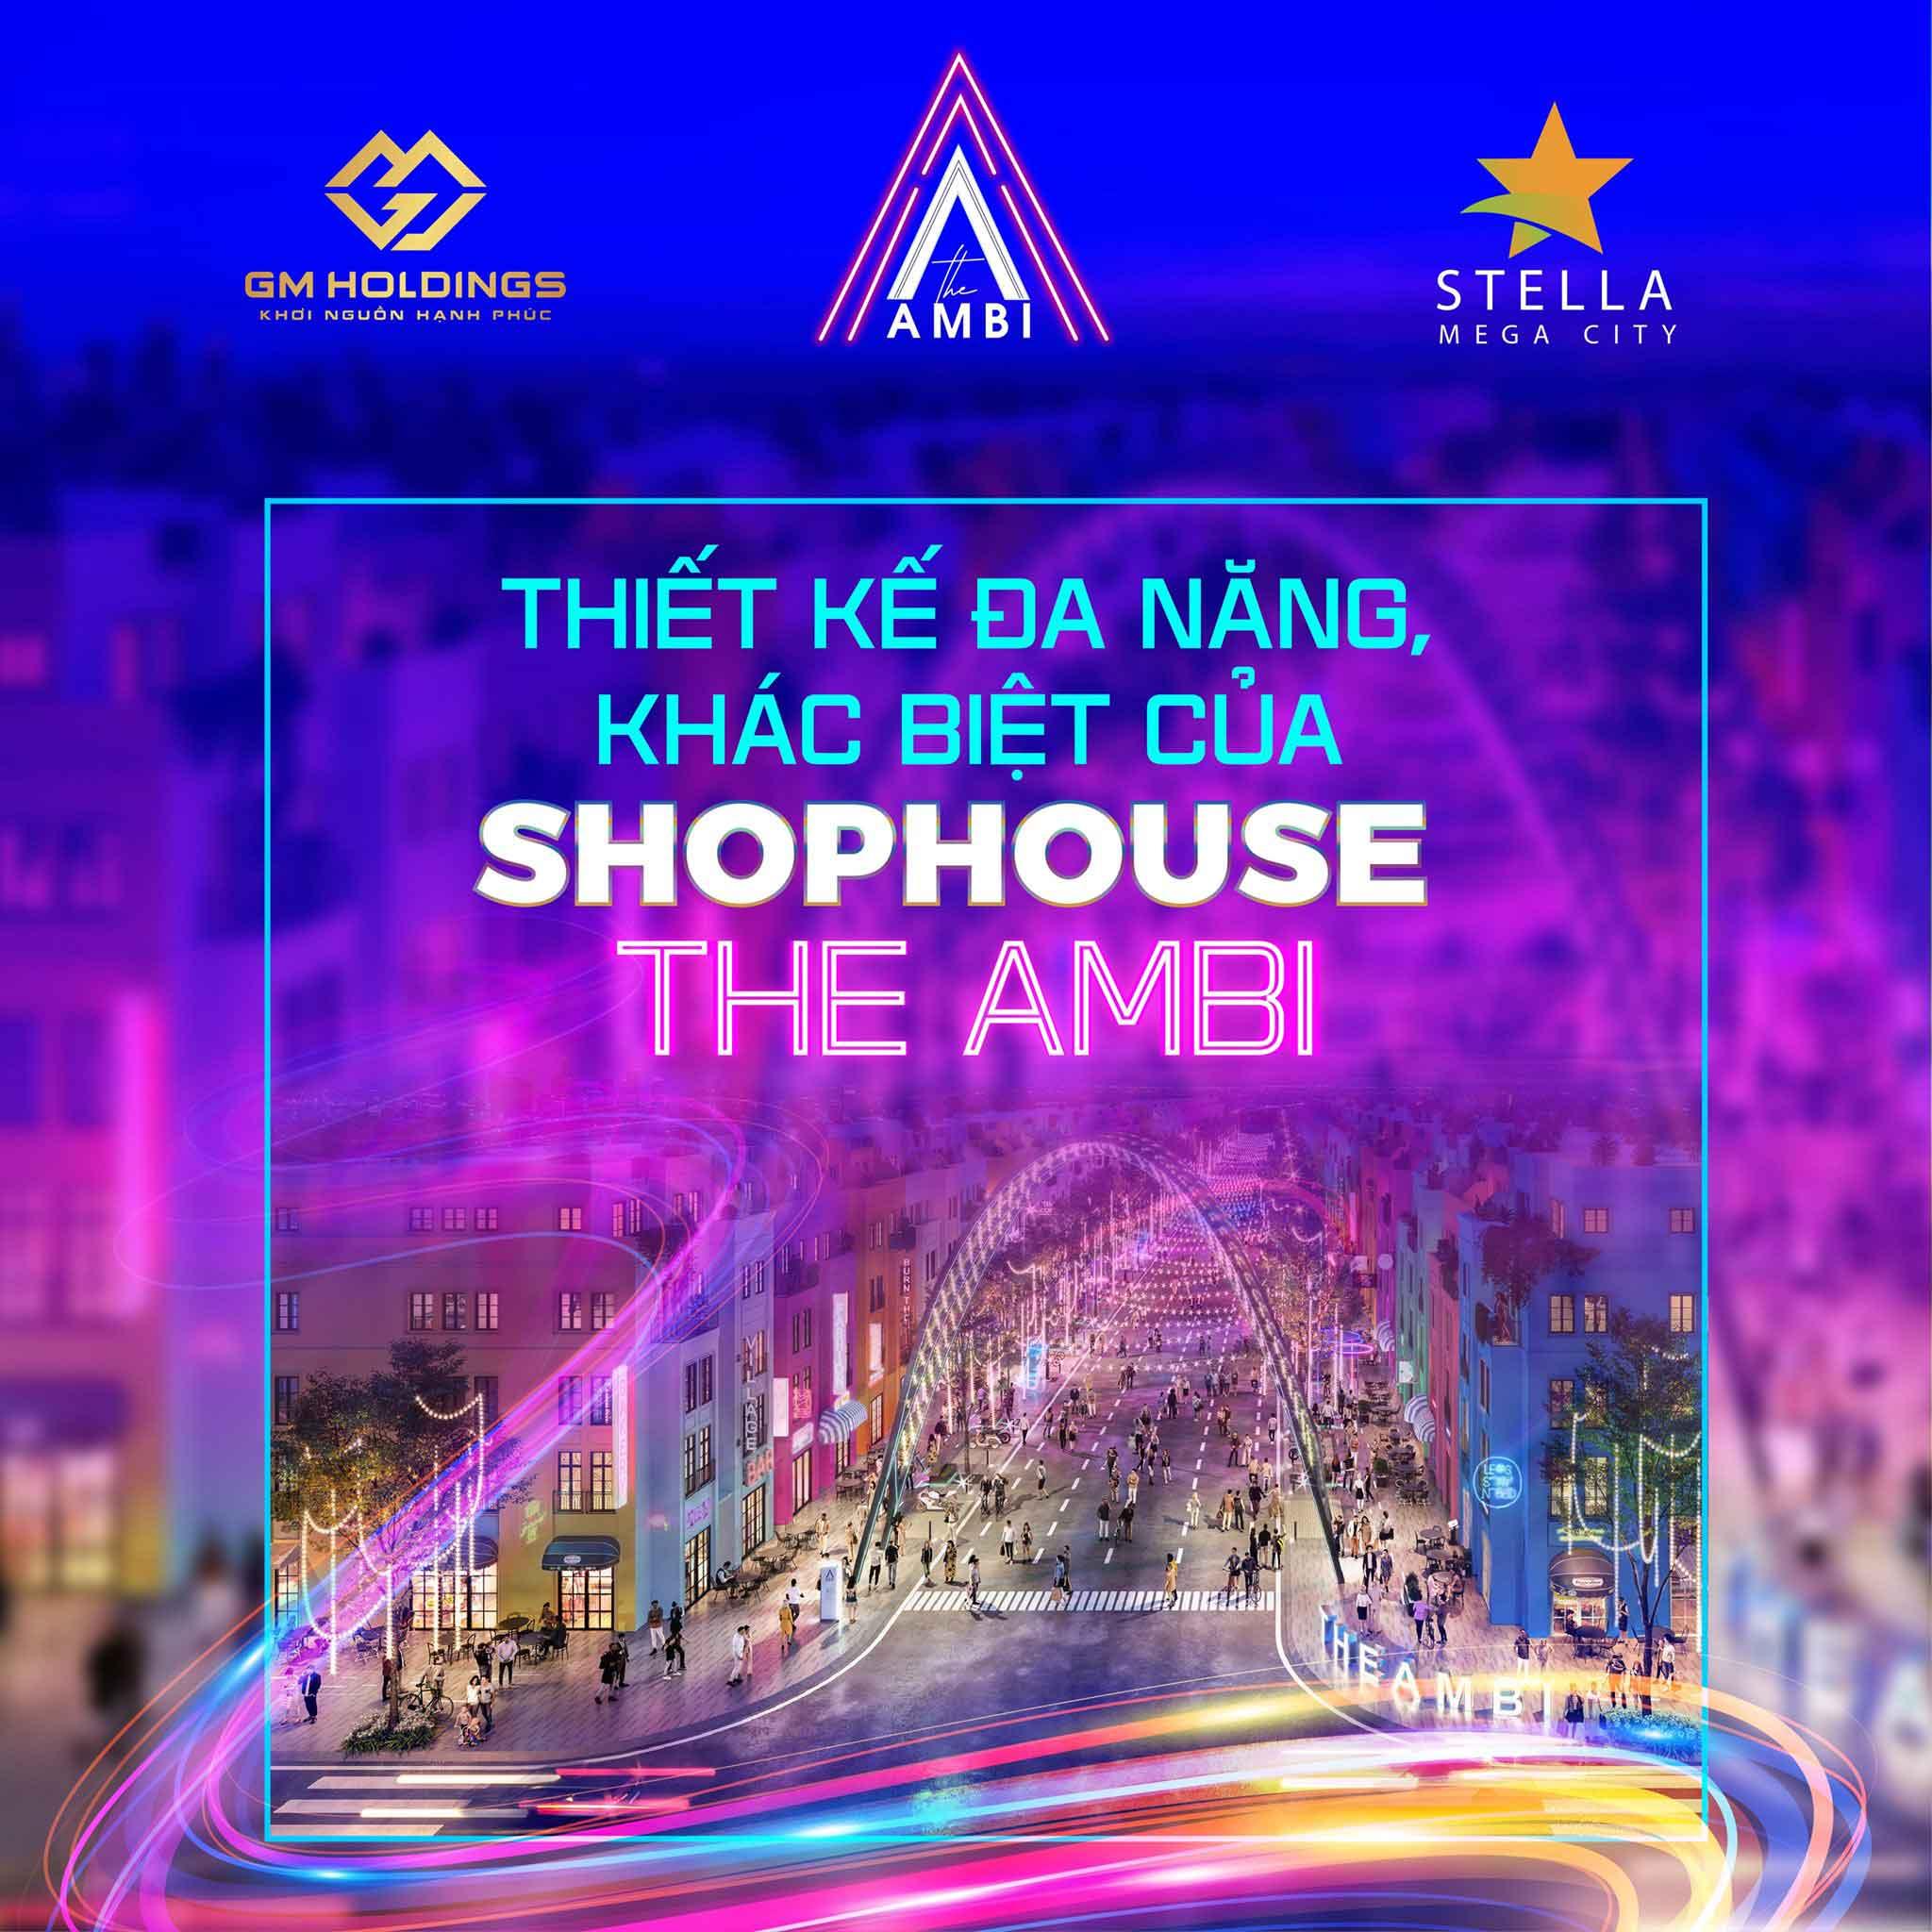 Shophouse The Ambi